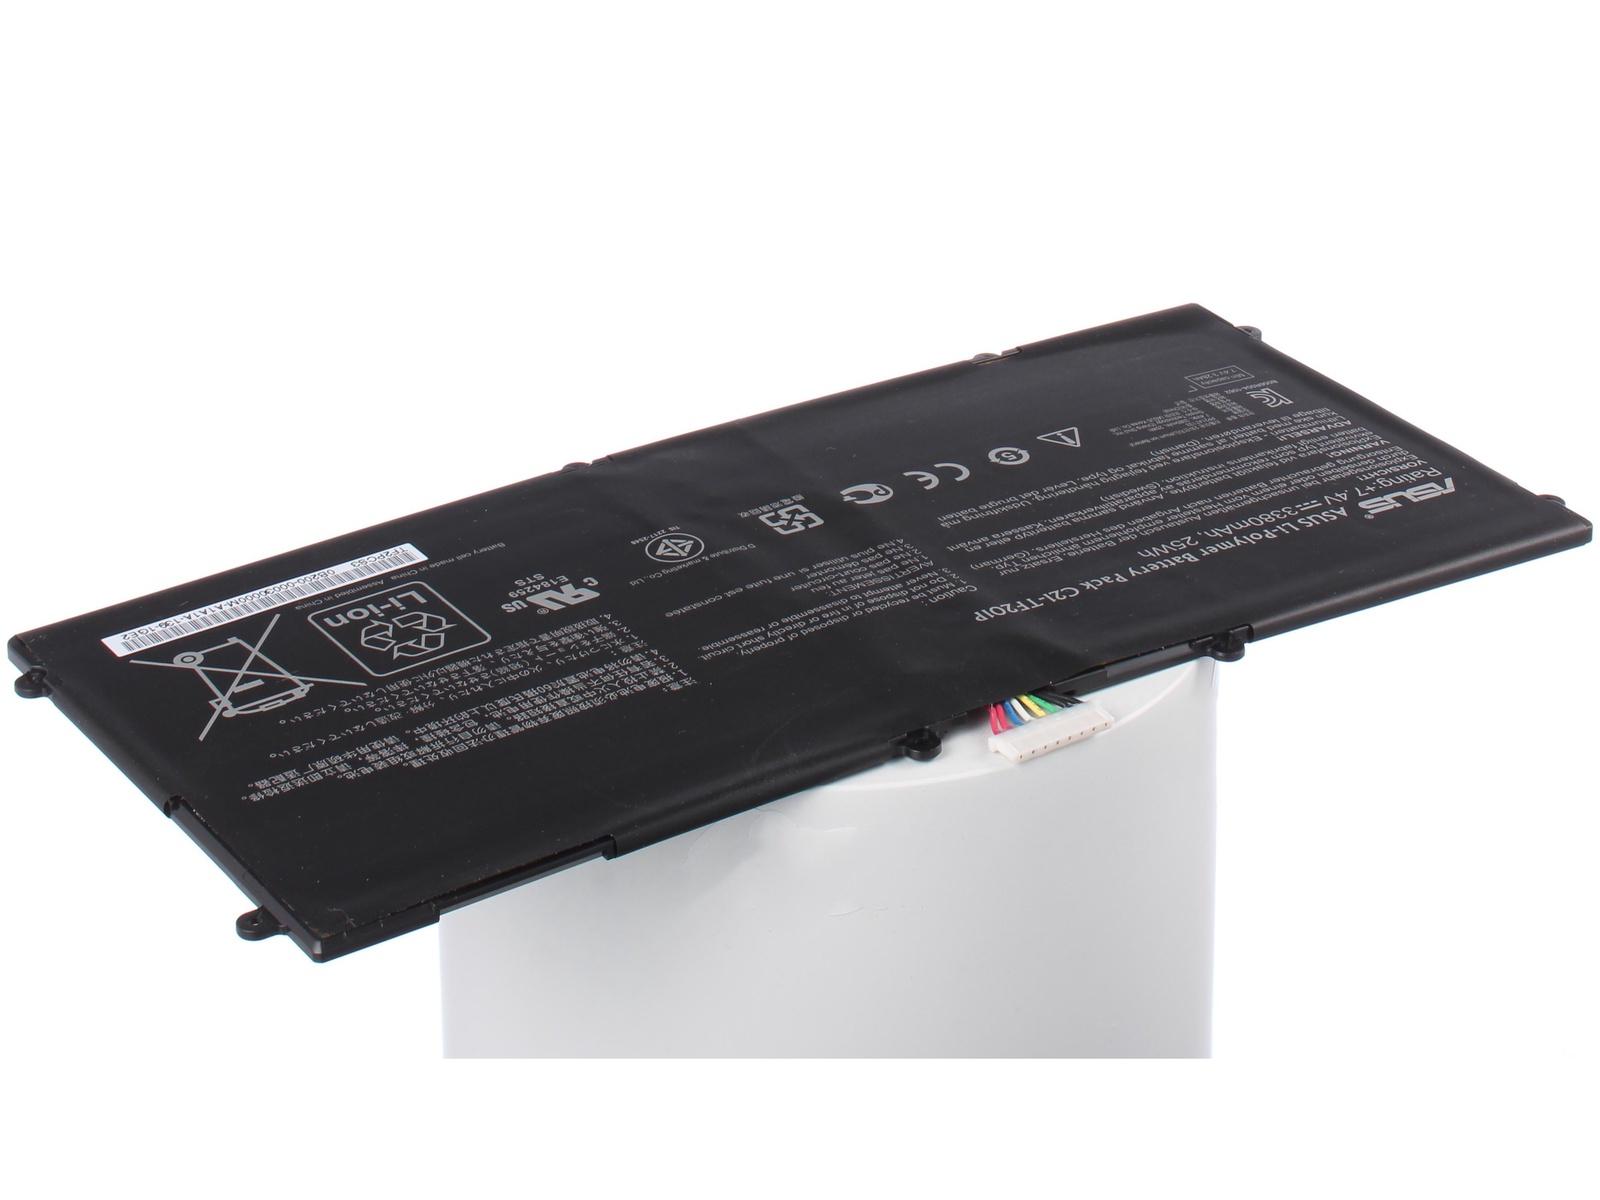 Аккумуляторная батарея iBatt iB-T1-A658 3380mAh для ноутбуков Asus пленка защитная red line для asus eee pad transformer tf300